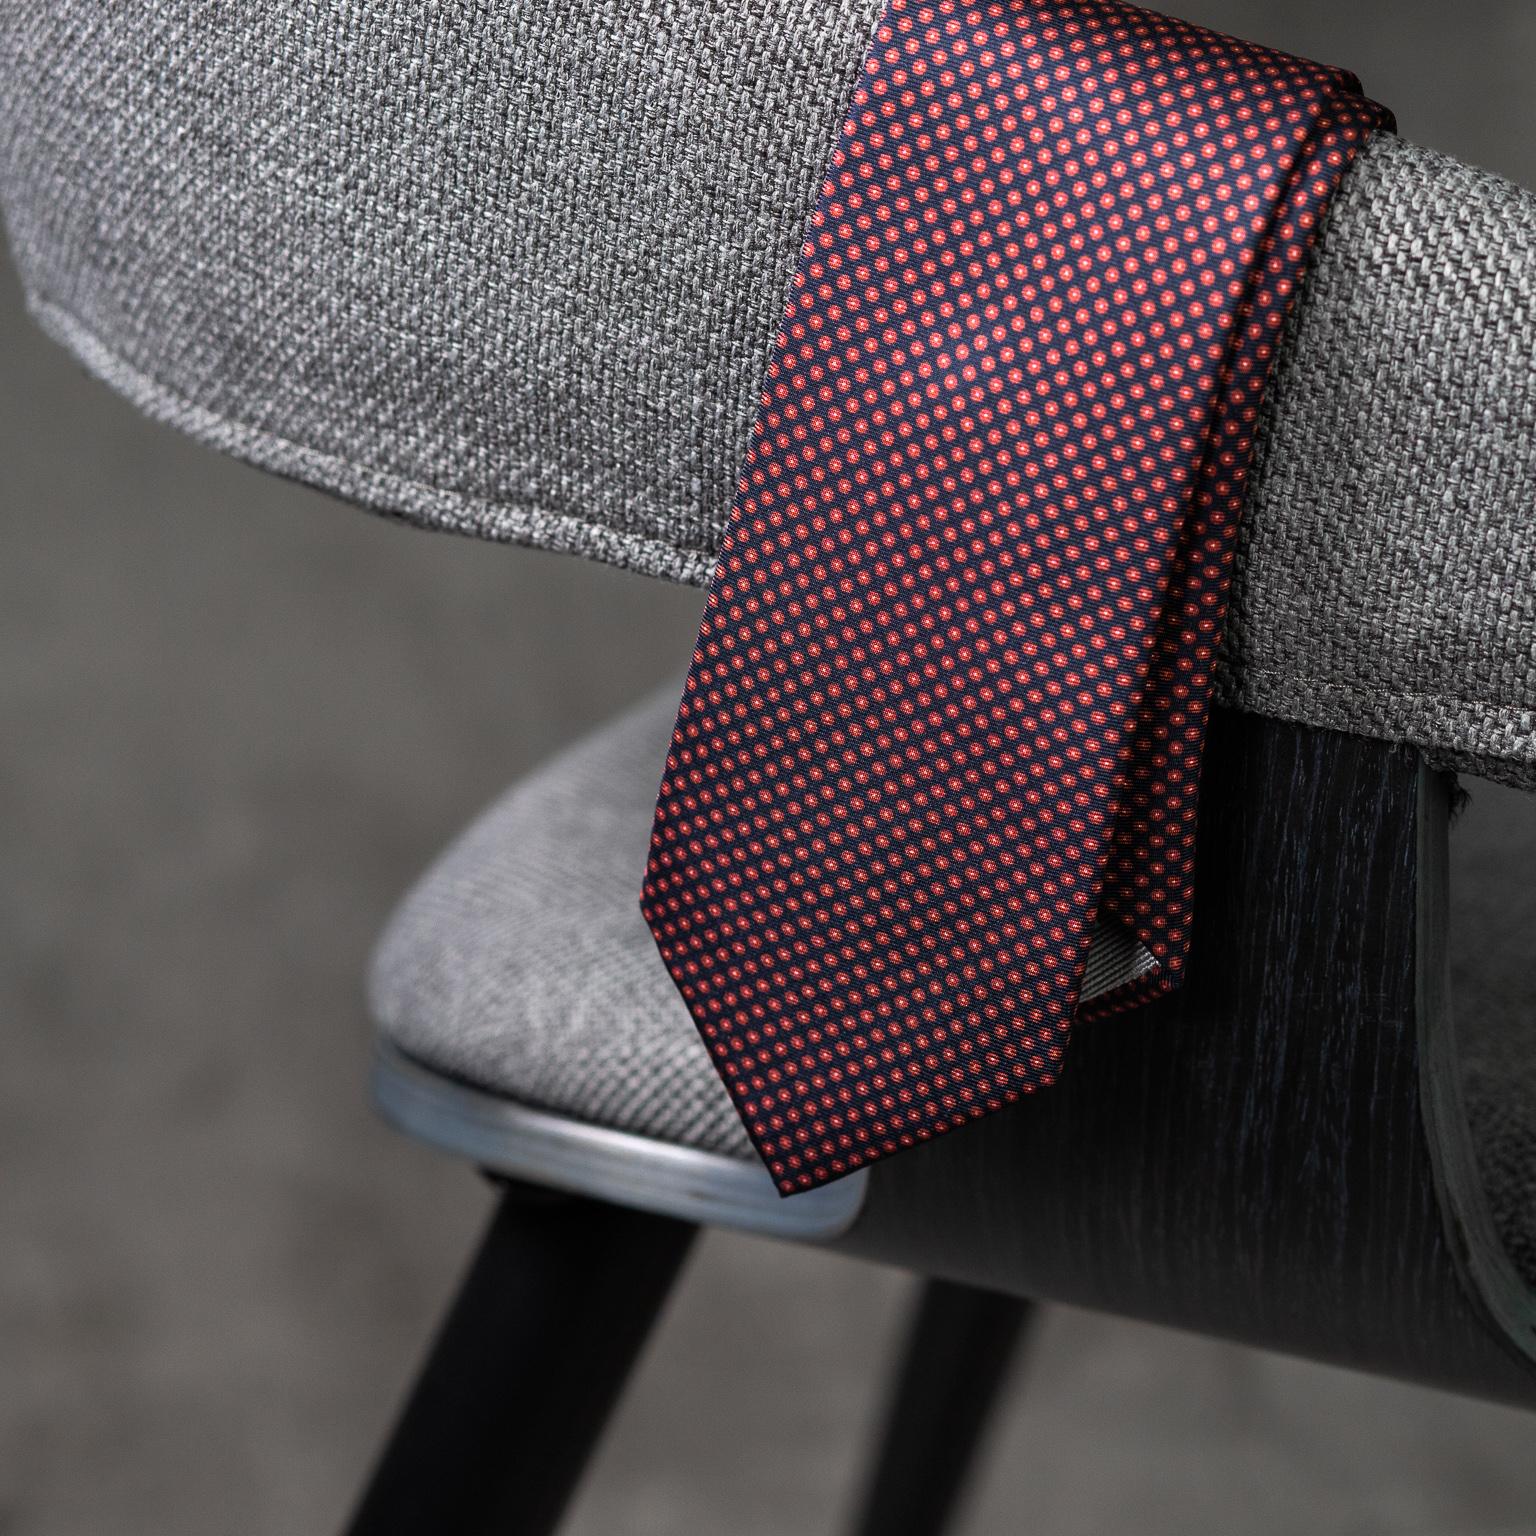 PRINTED-SILK-SEDA-ESTAMPADA-0581-Tie-Initials-Corbata-Iniciales-The-Seëlk-3